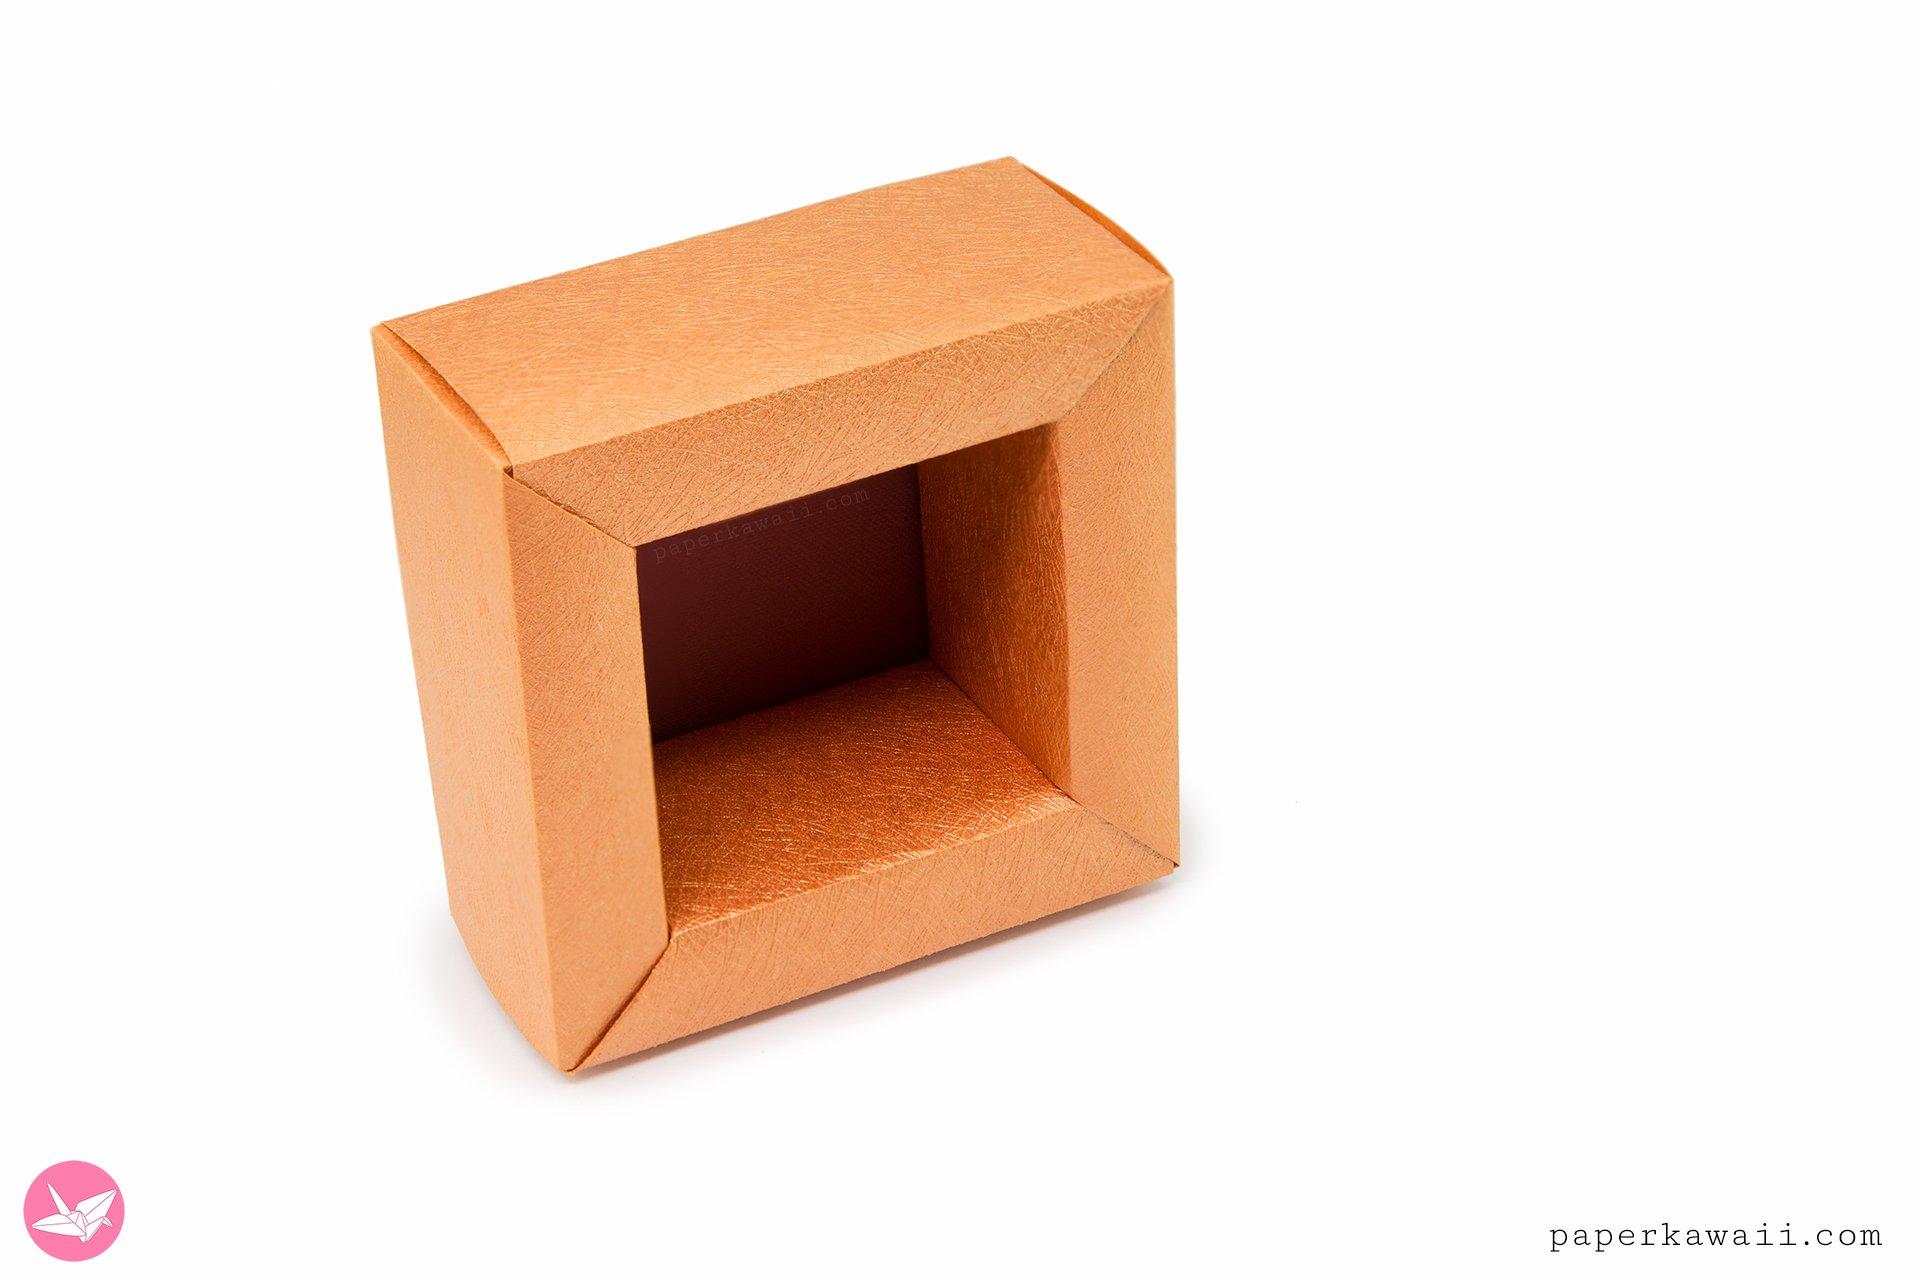 Modular Origami Display Frame Tutorial via @paper_kawaii